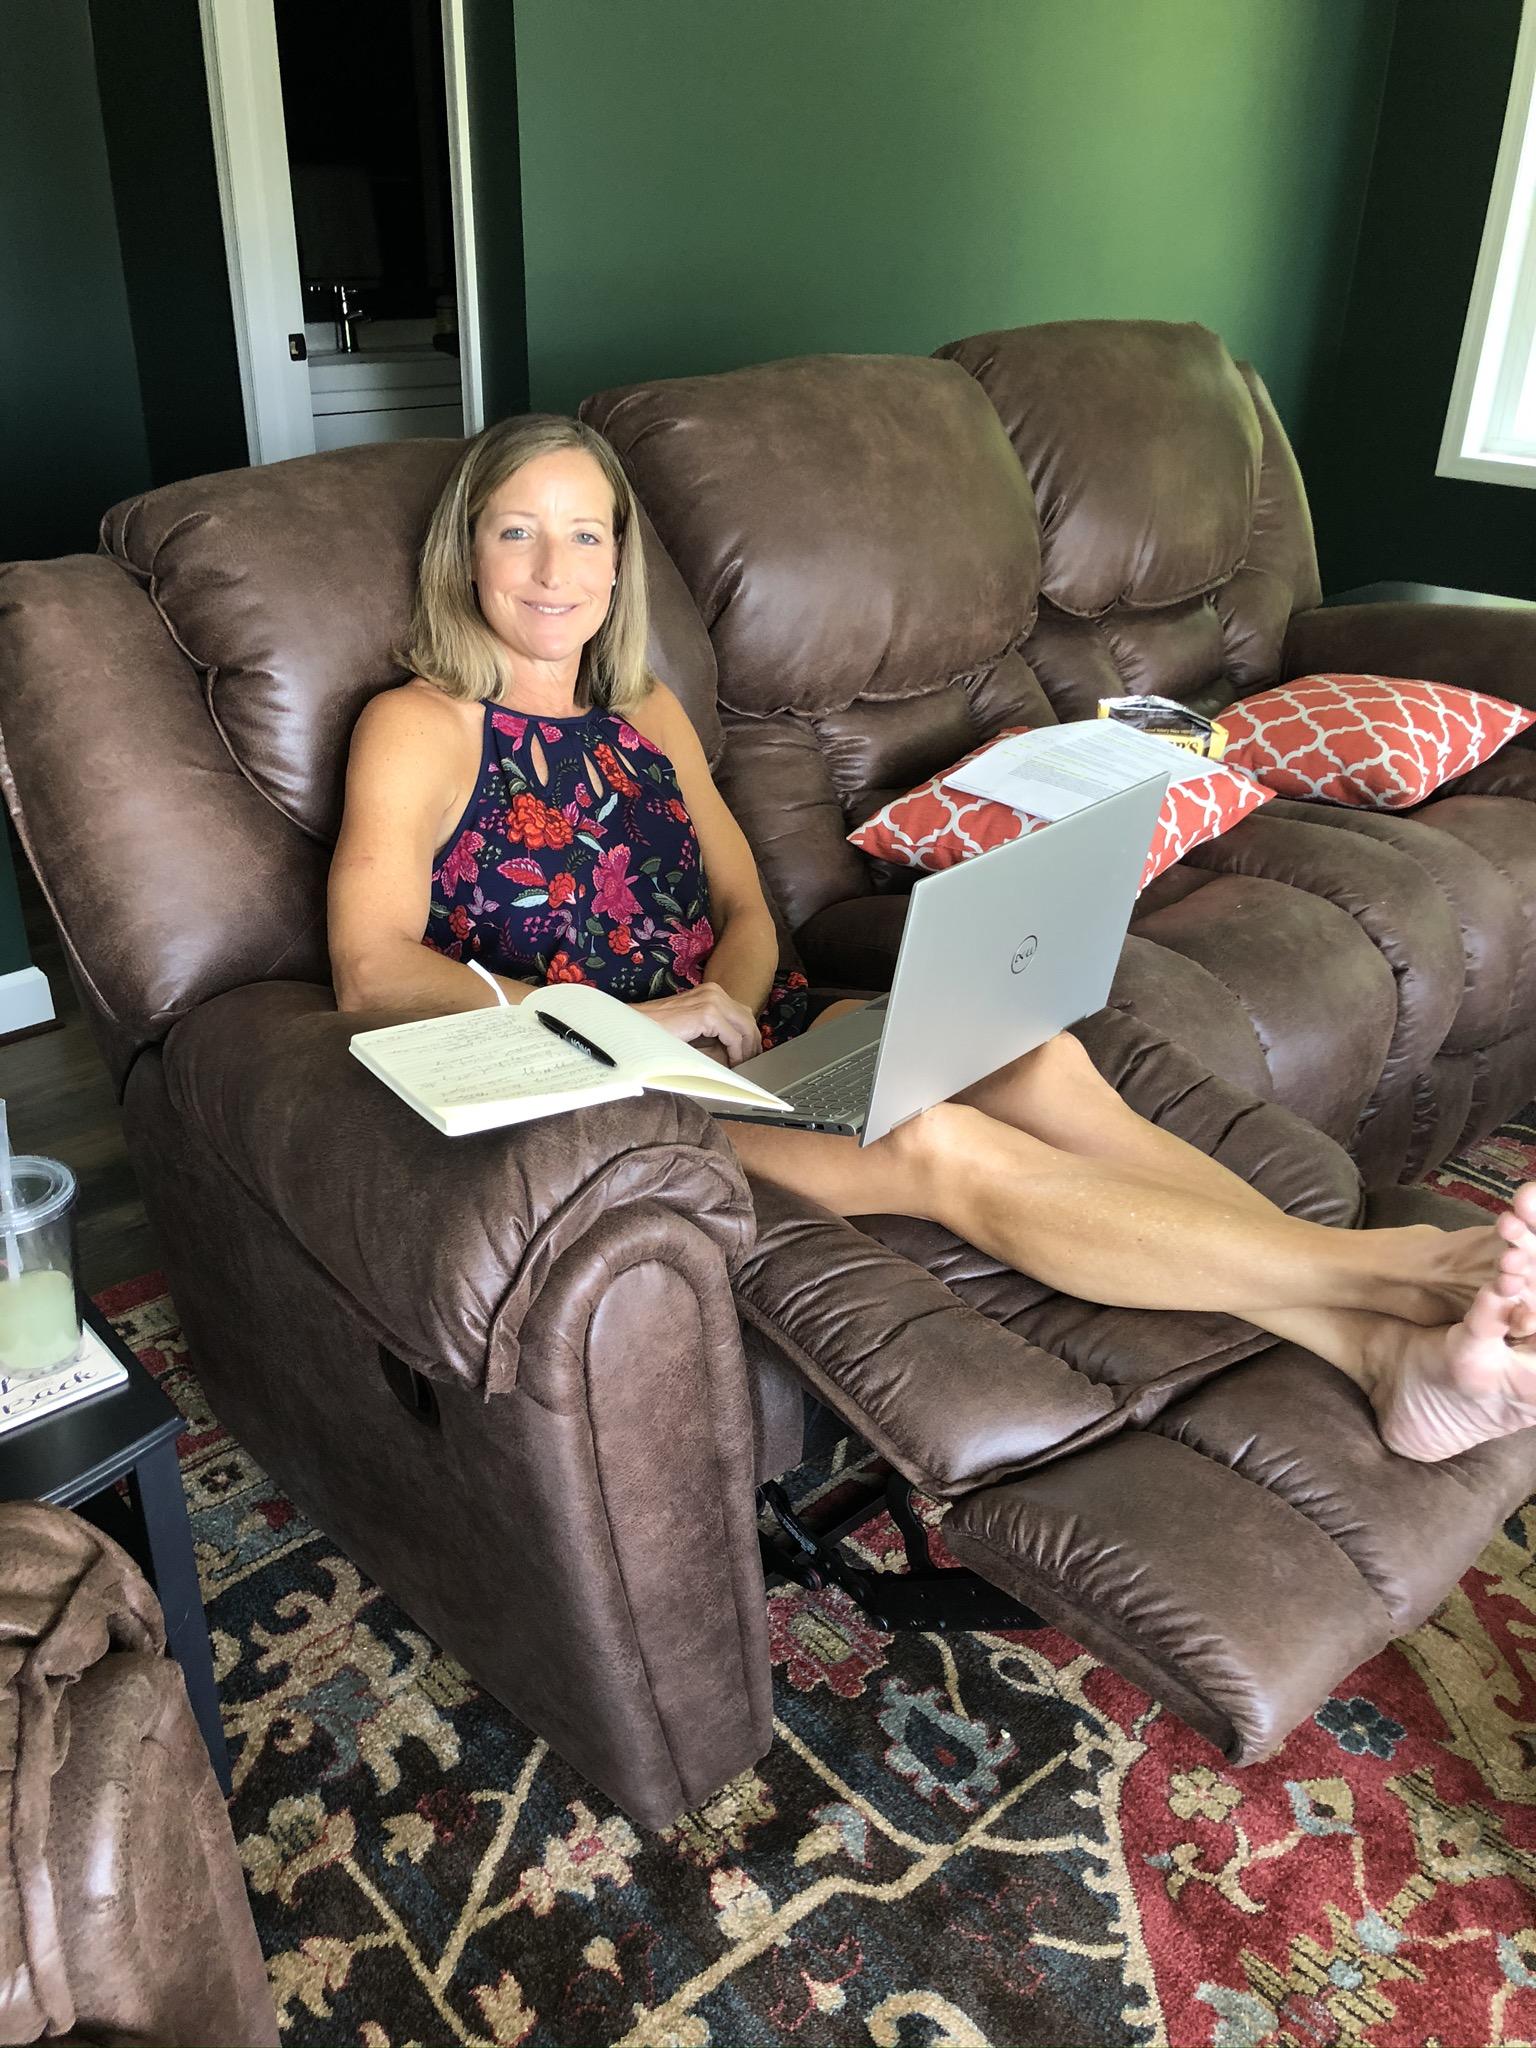 Paula Skulina blogging from a Homestretch sofa recliner